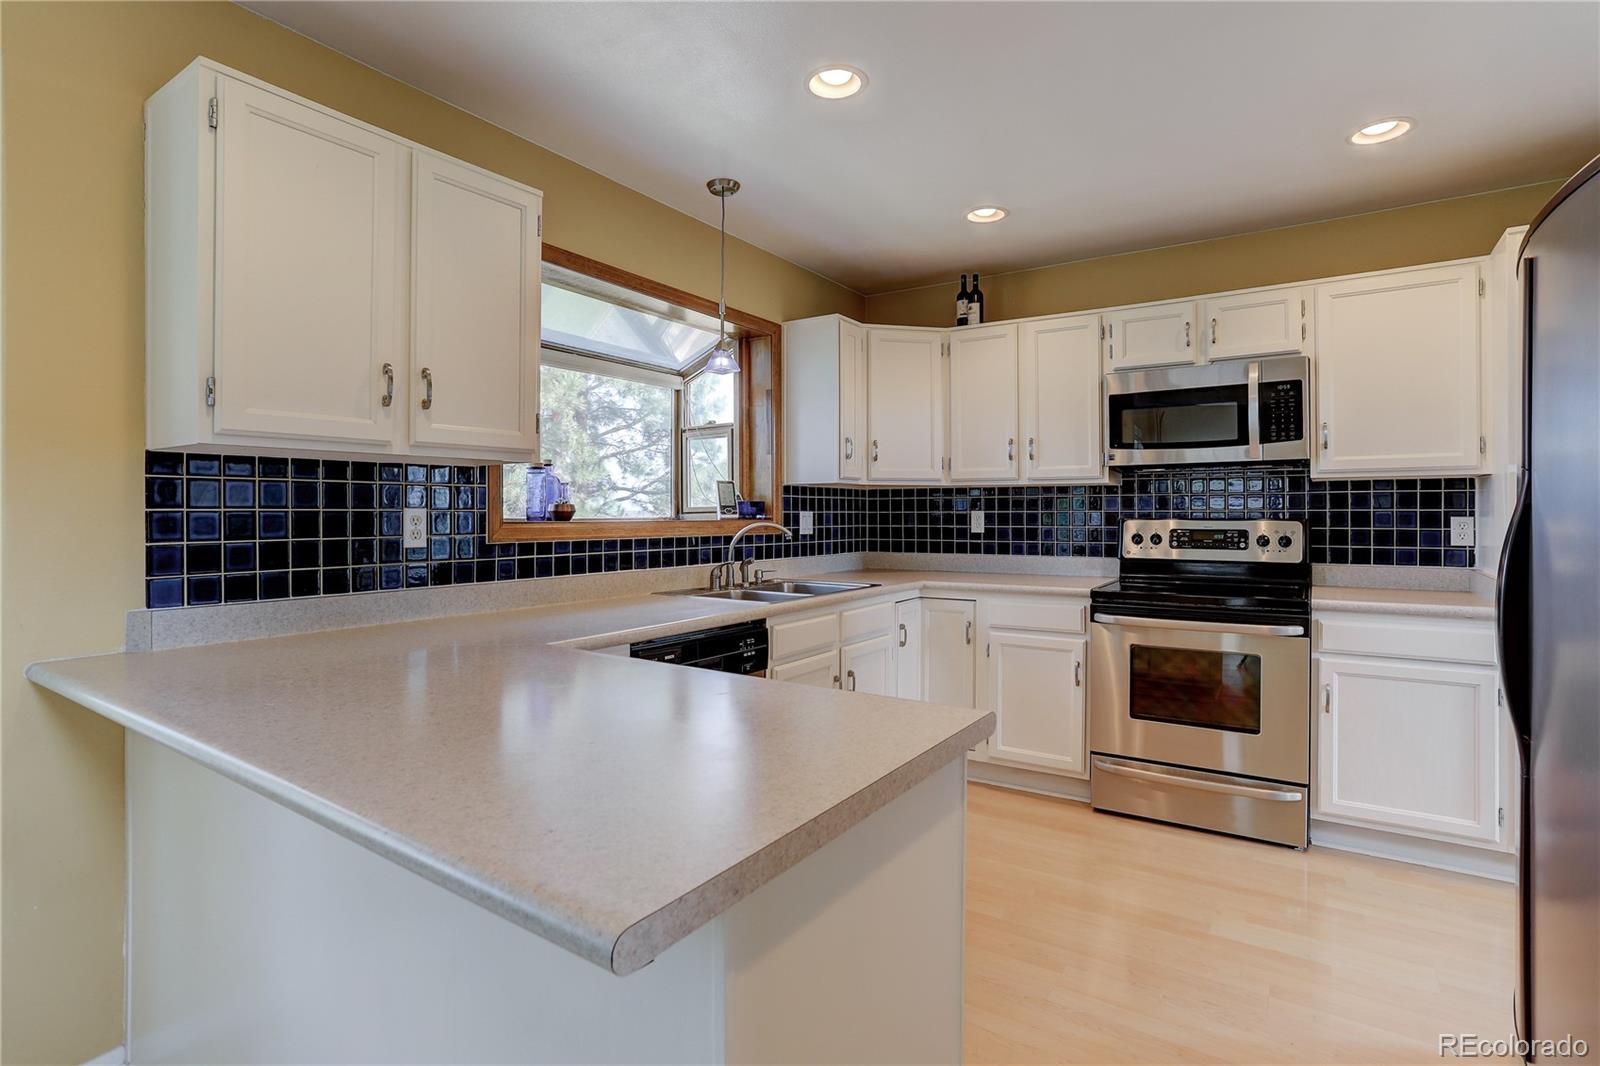 MLS# 9389187 - 3 - 1245 Goldsmith Drive, Highlands Ranch, CO 80126